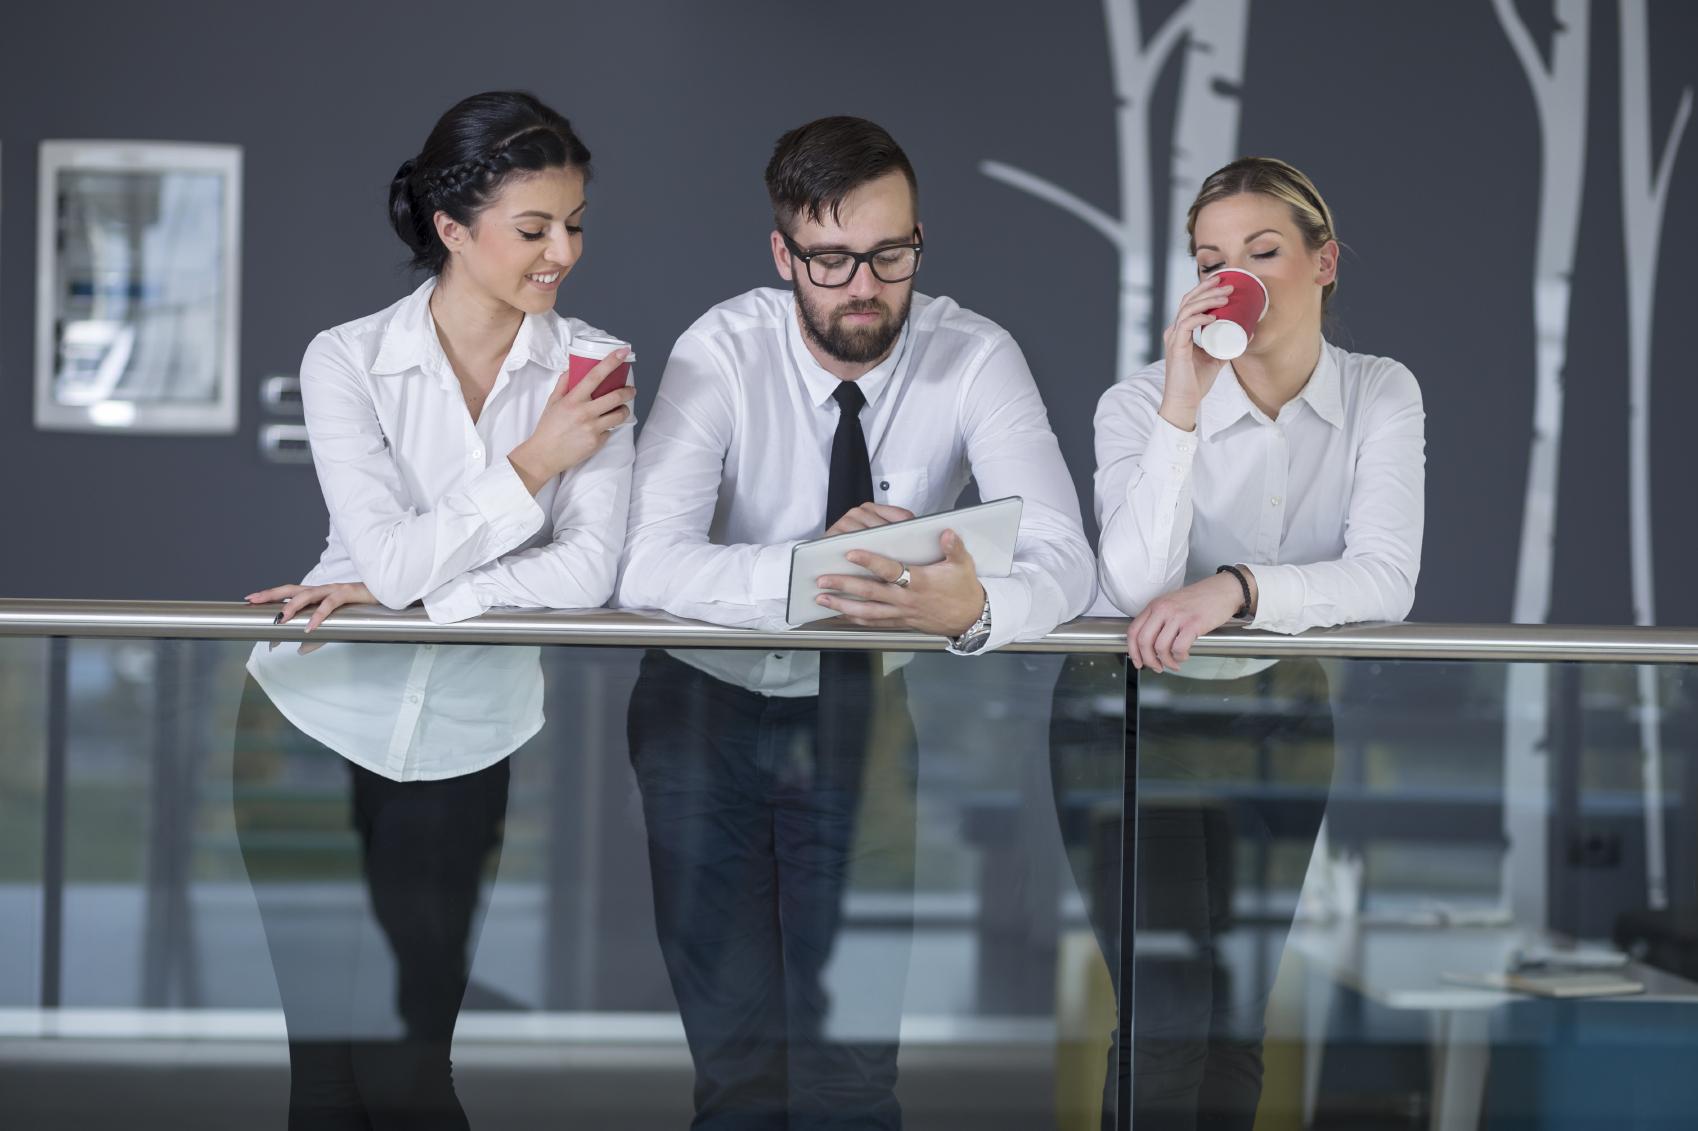 Stock photo of an informal business meeting